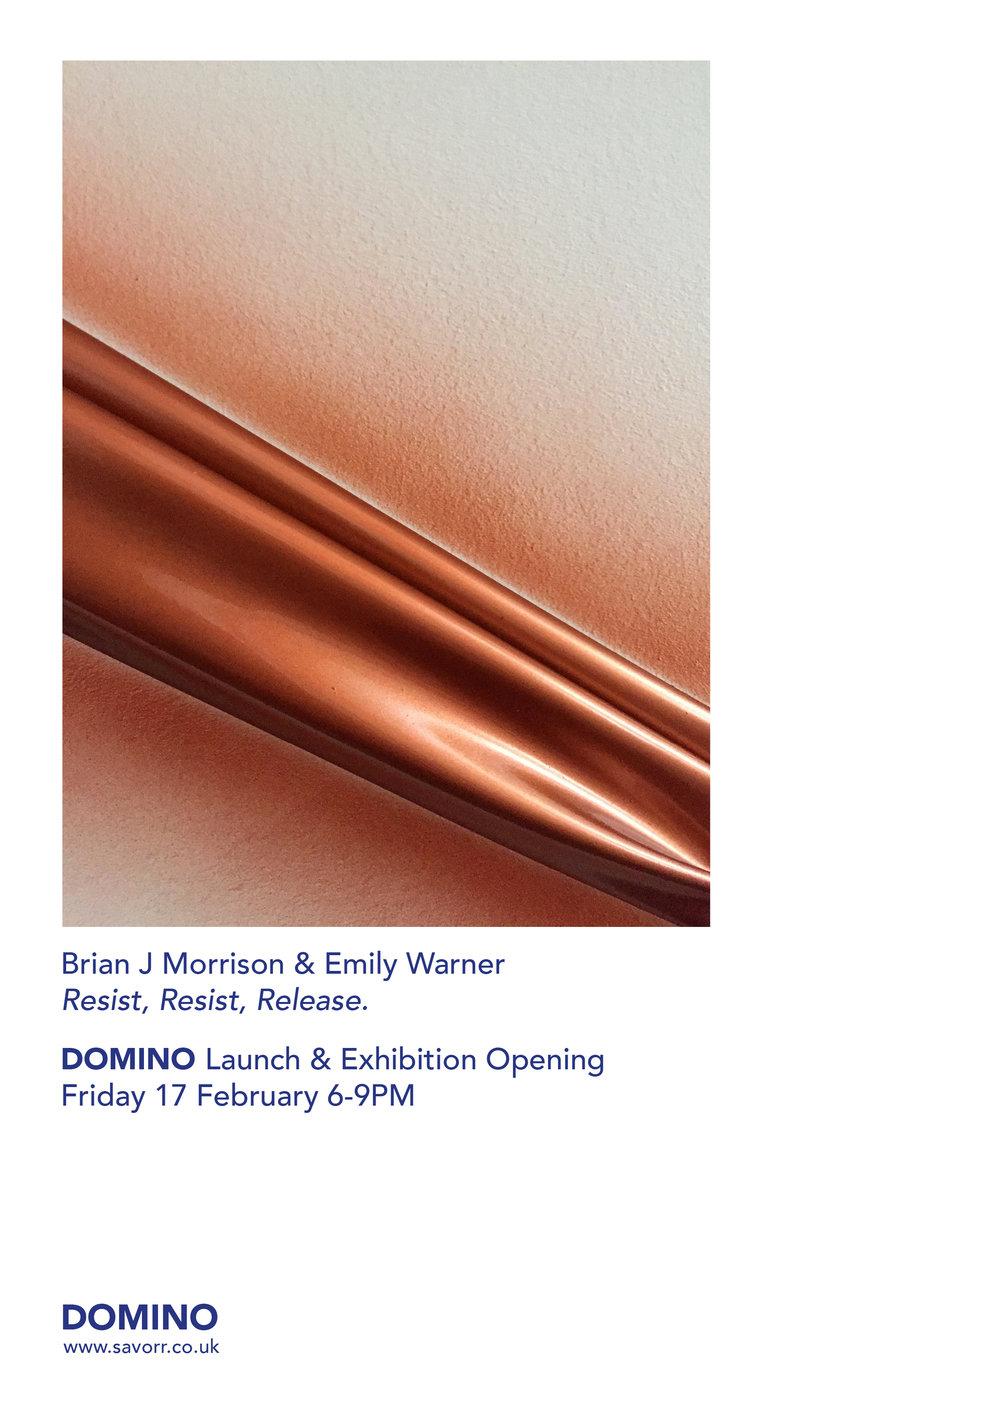 Brian J Morrison + Emily Warner:Resist, Resist, Release.  Opening performance + Install documentation